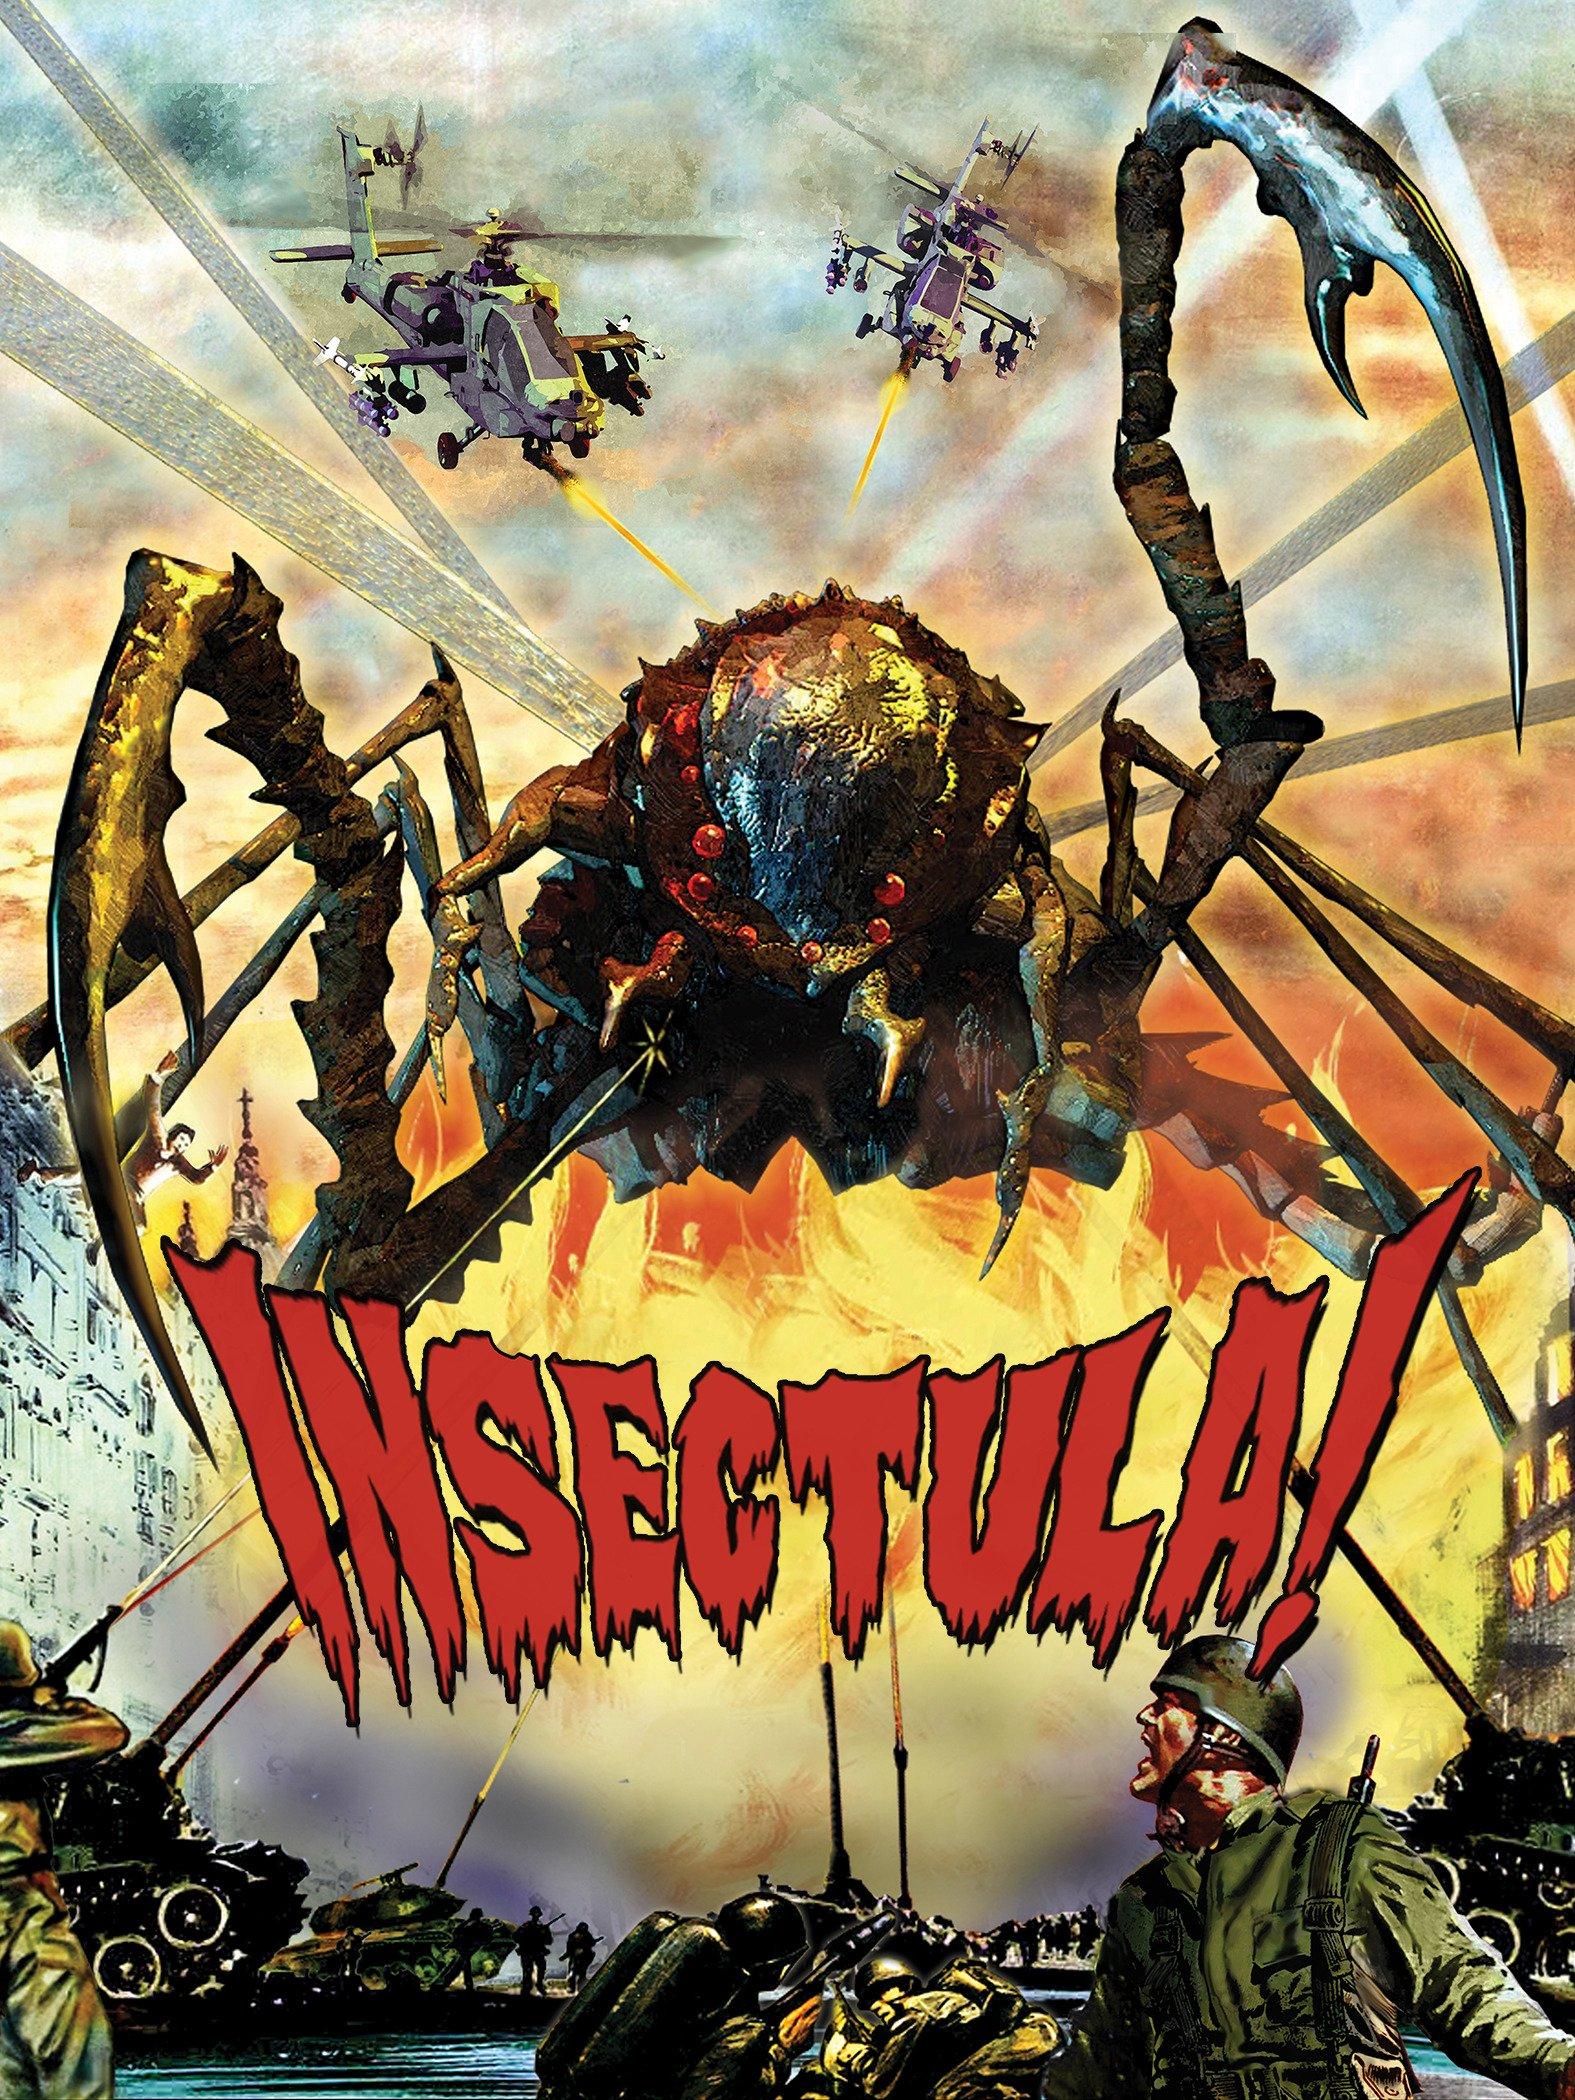 Insectula! on Amazon Prime Video UK